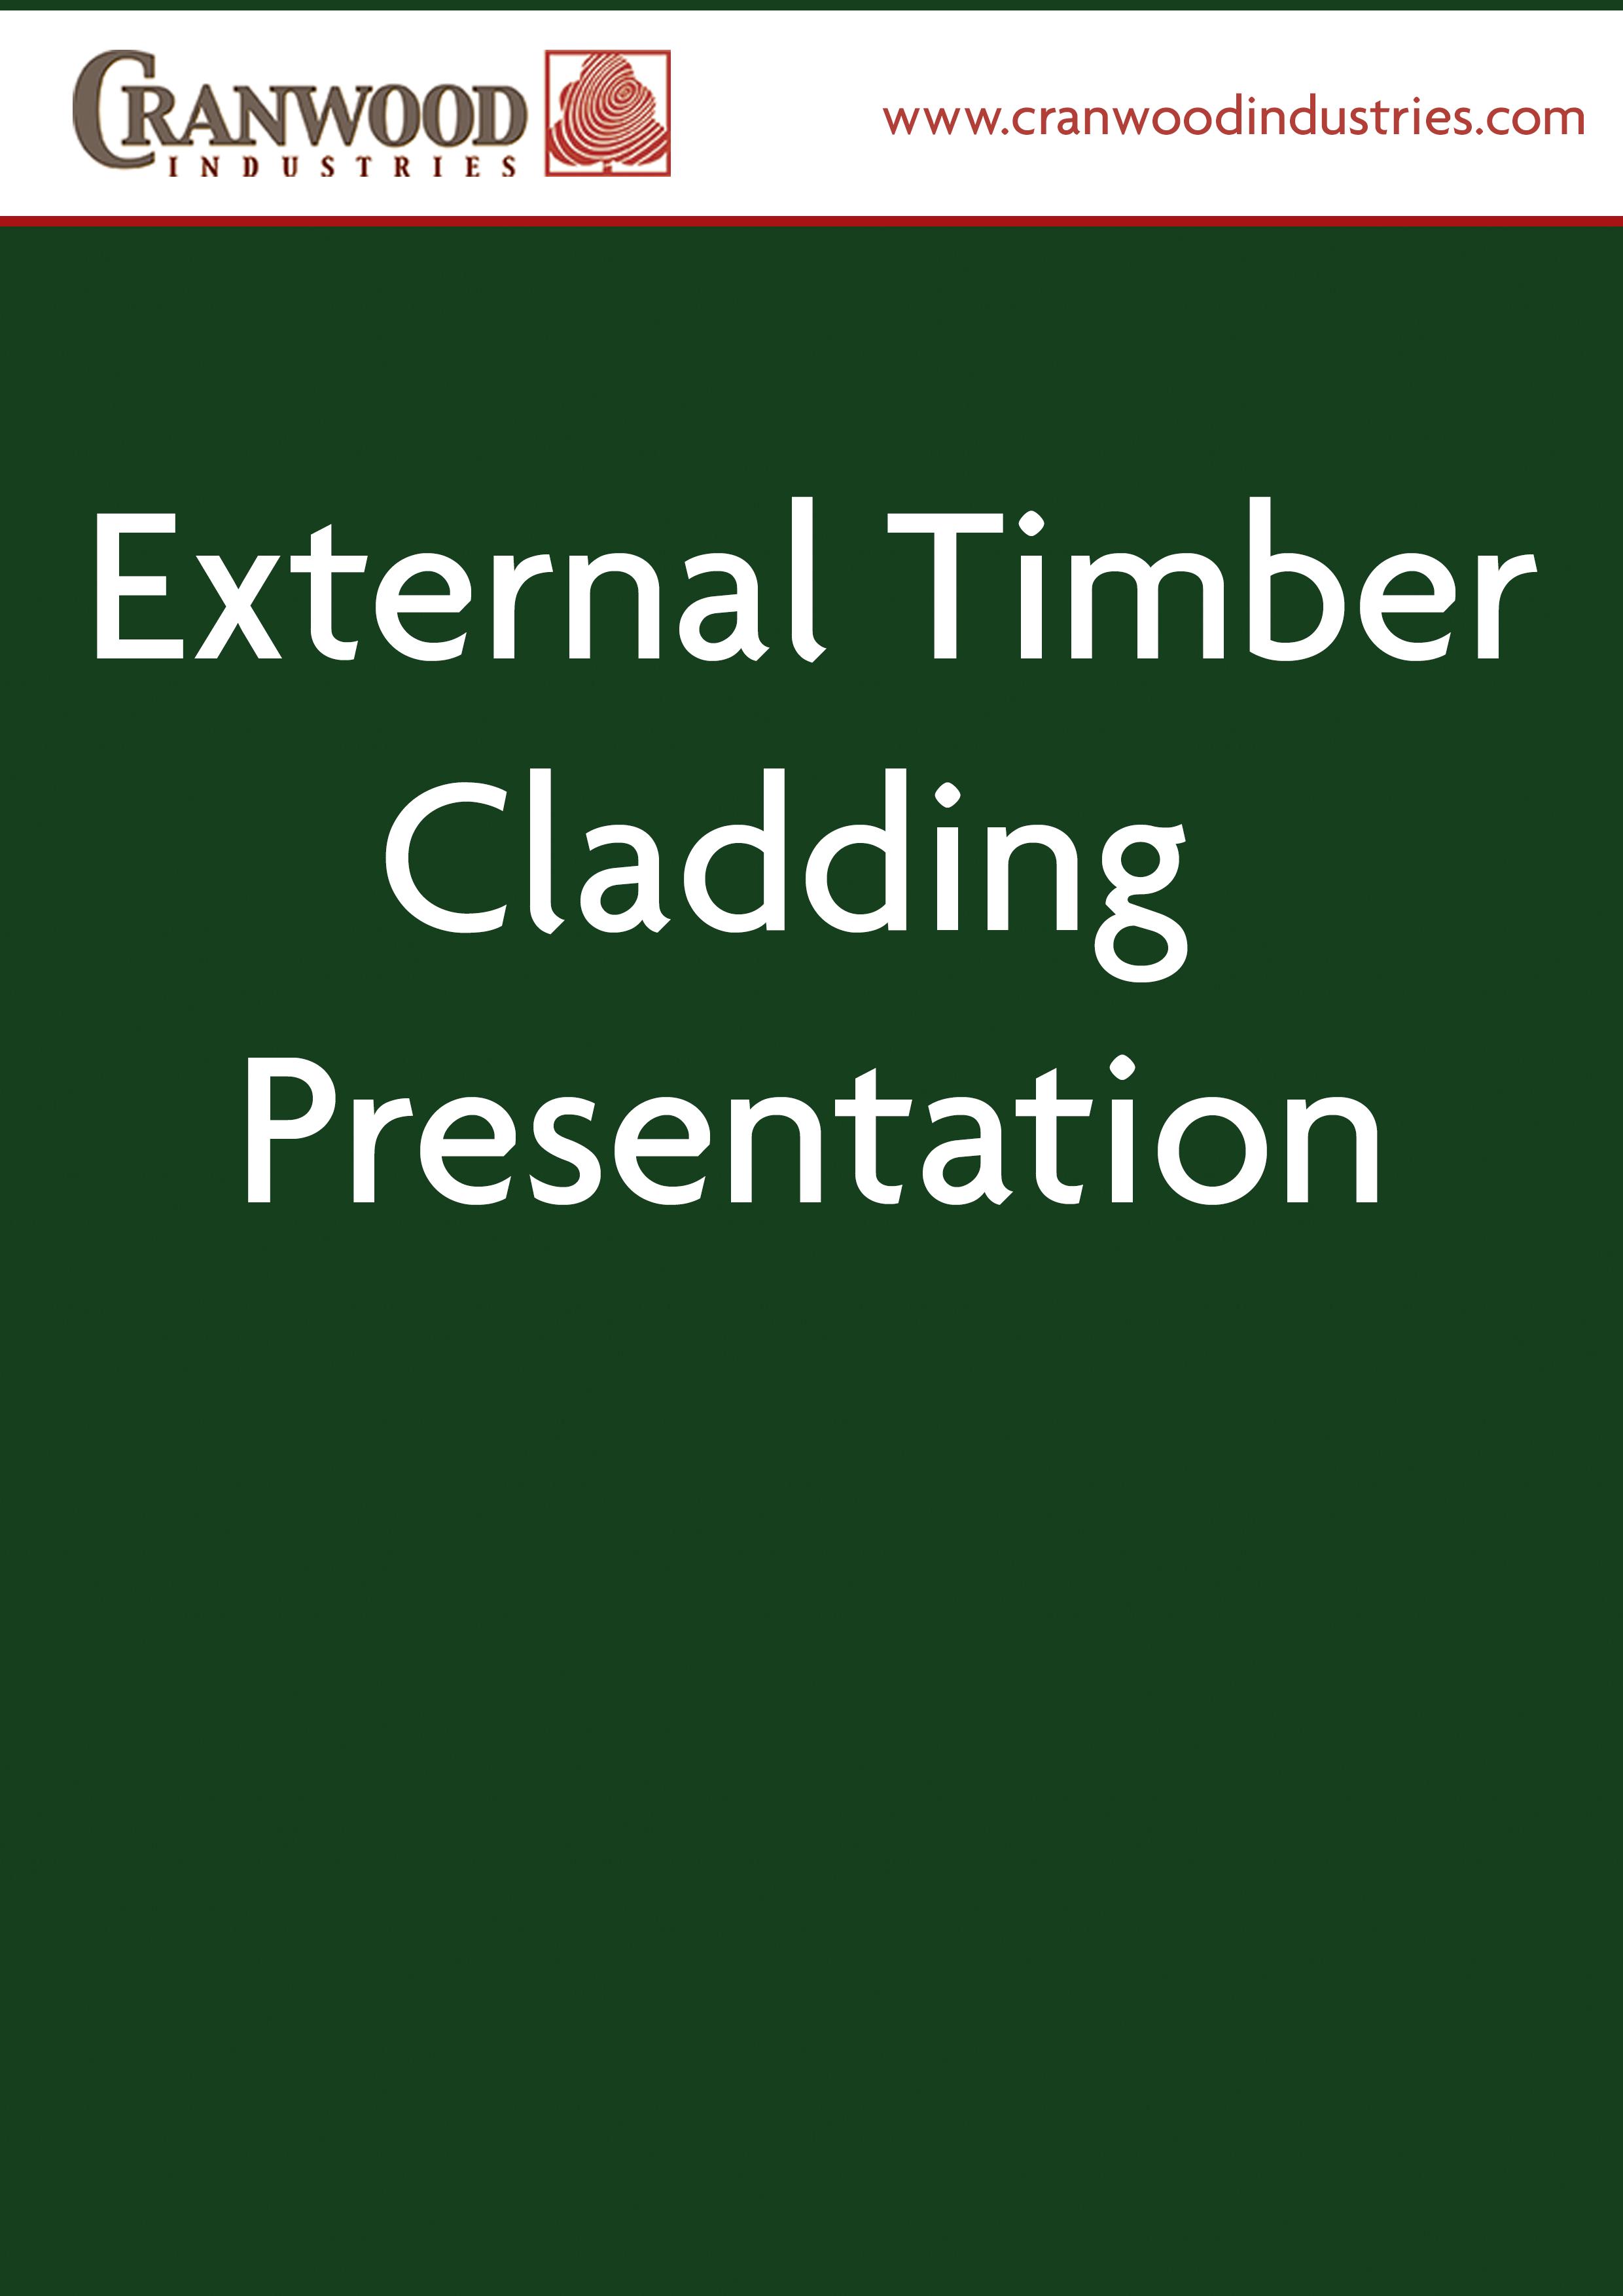 External Timber Cladding Presentation